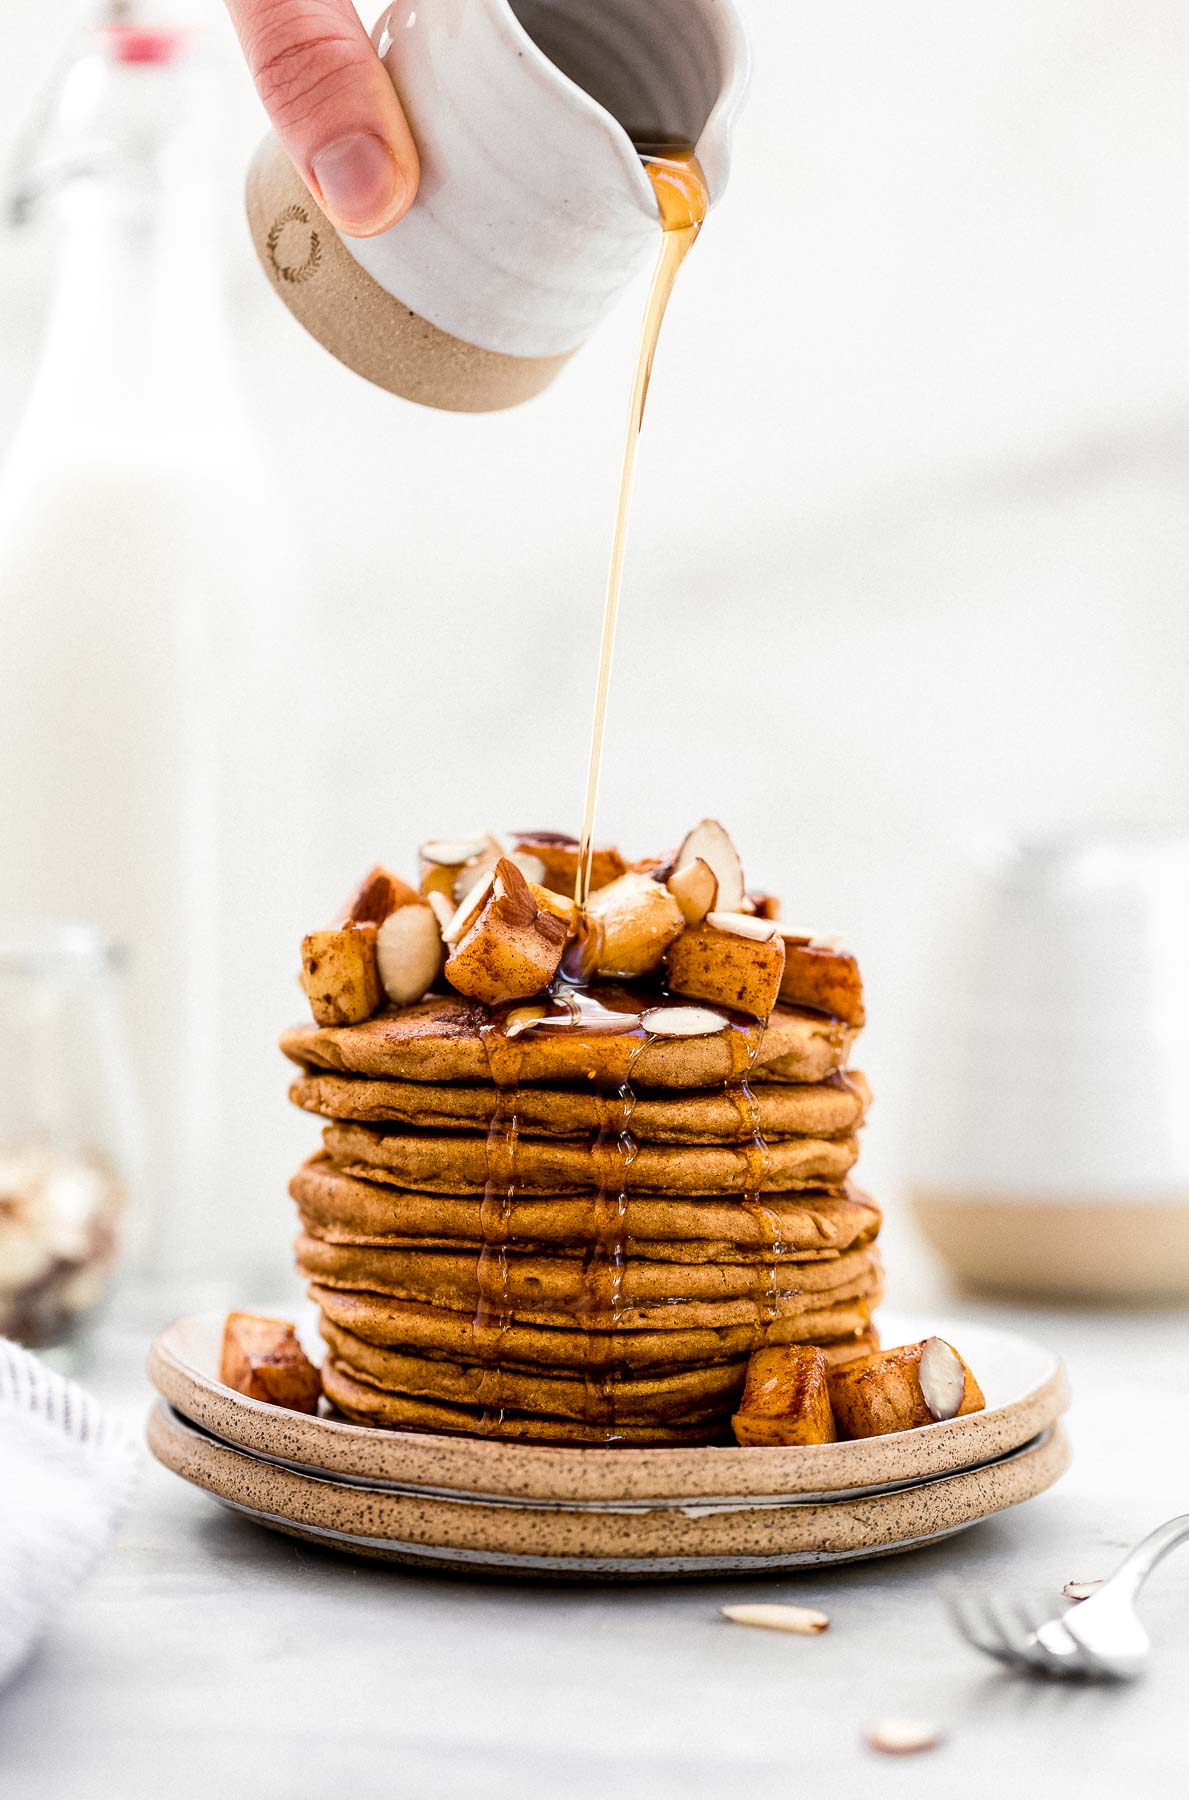 Sweet potato pancakes on a plate.